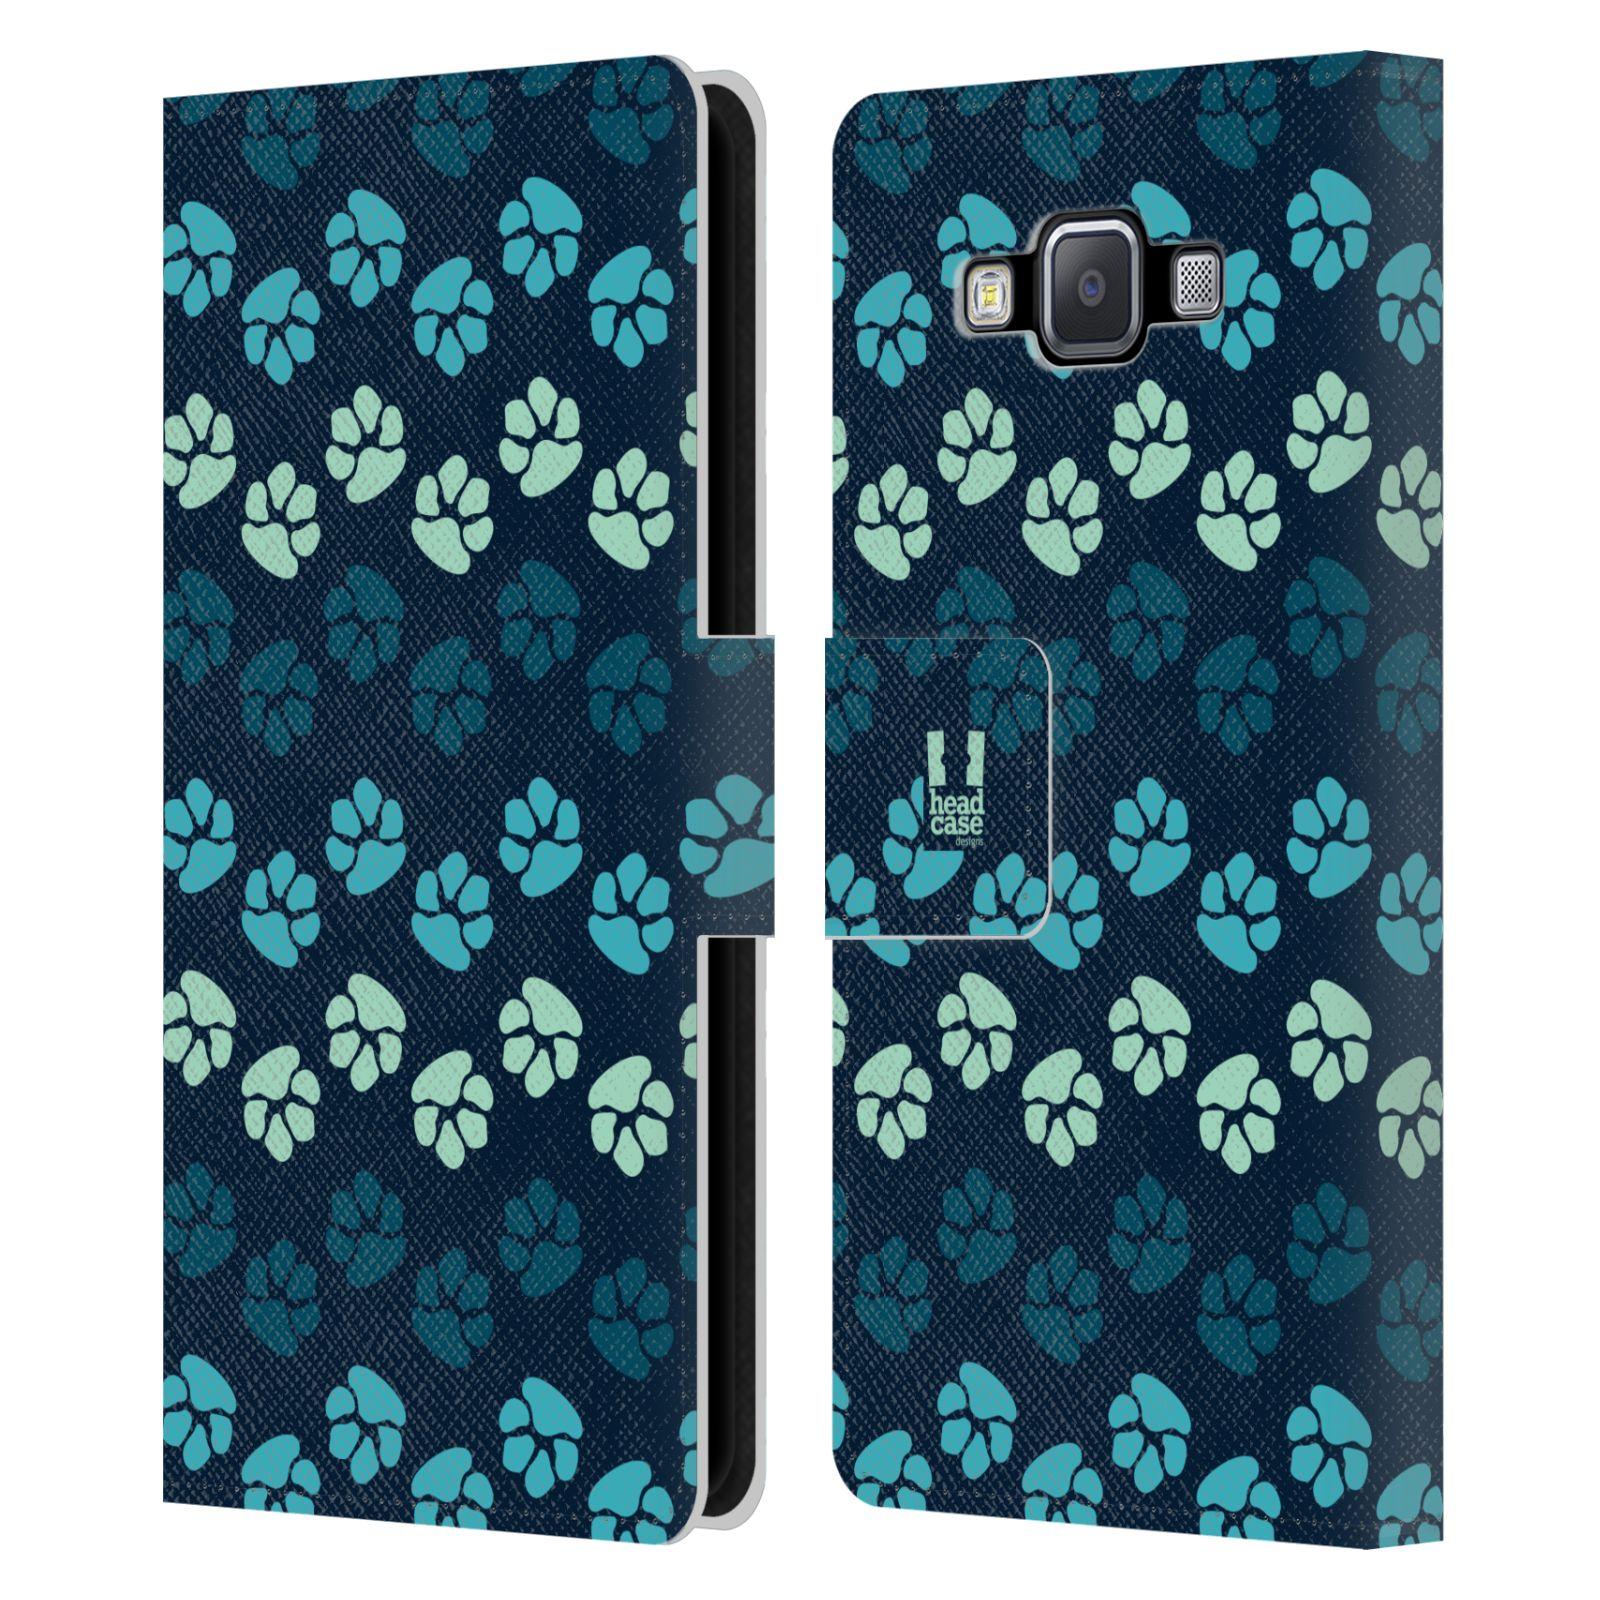 HEAD CASE Flipové pouzdro pro mobil Samsung Galaxy A5 Pejsek ťapky modrá barva